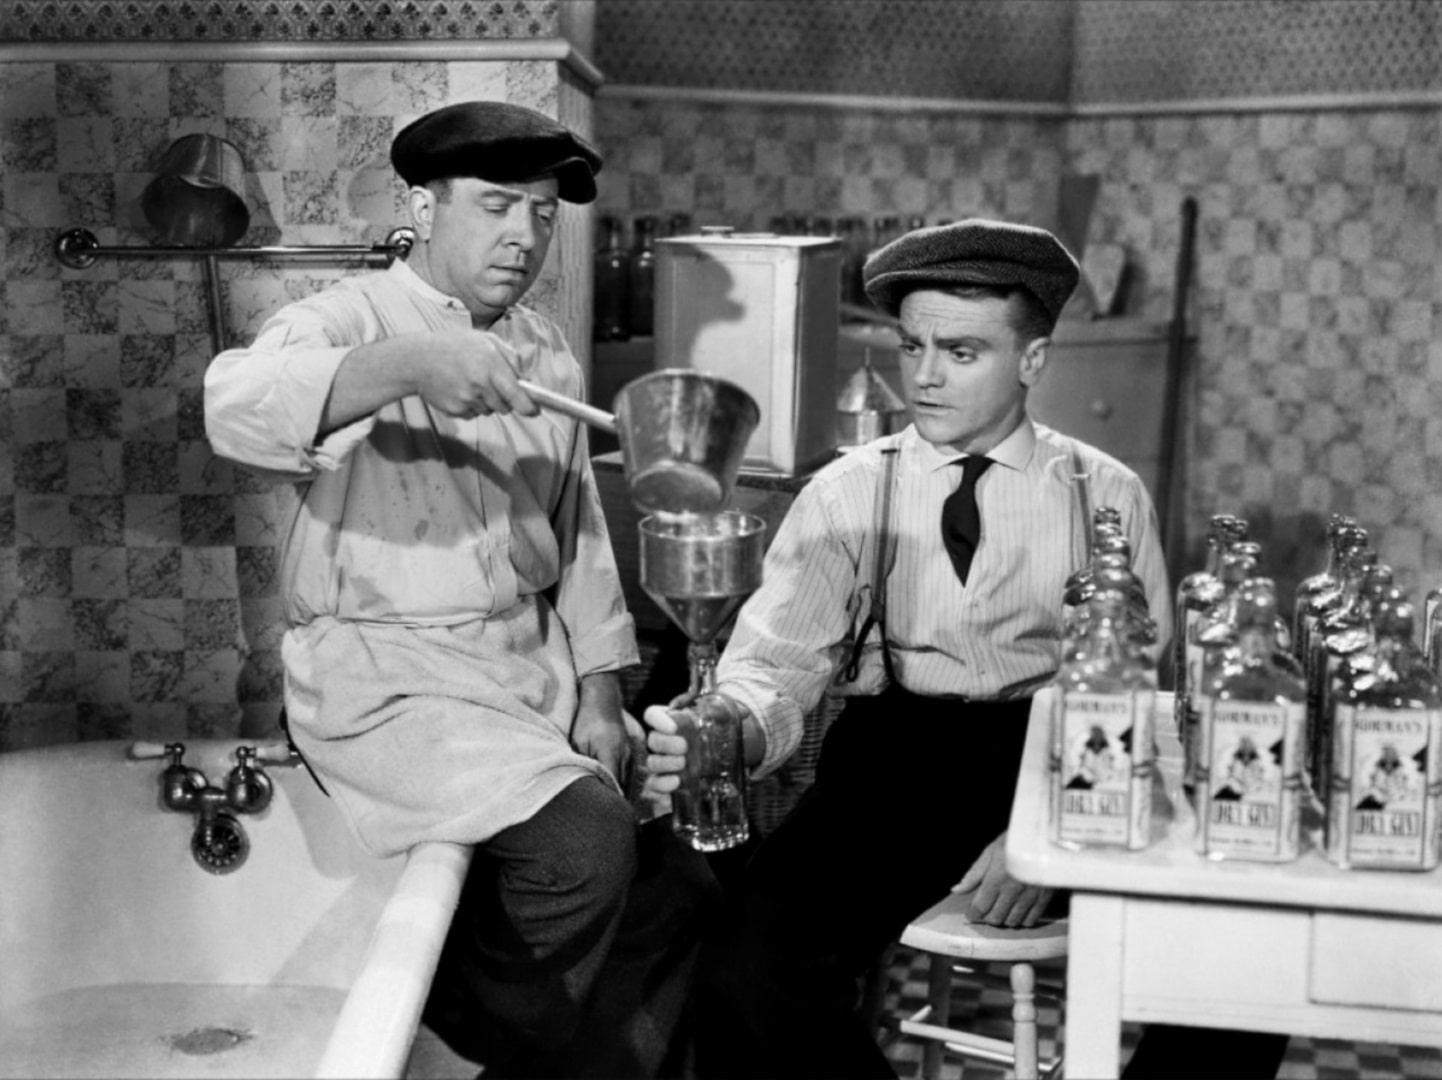 Судьба солдата в Америке / The Roaring Twenties (1939): кадр из фильма